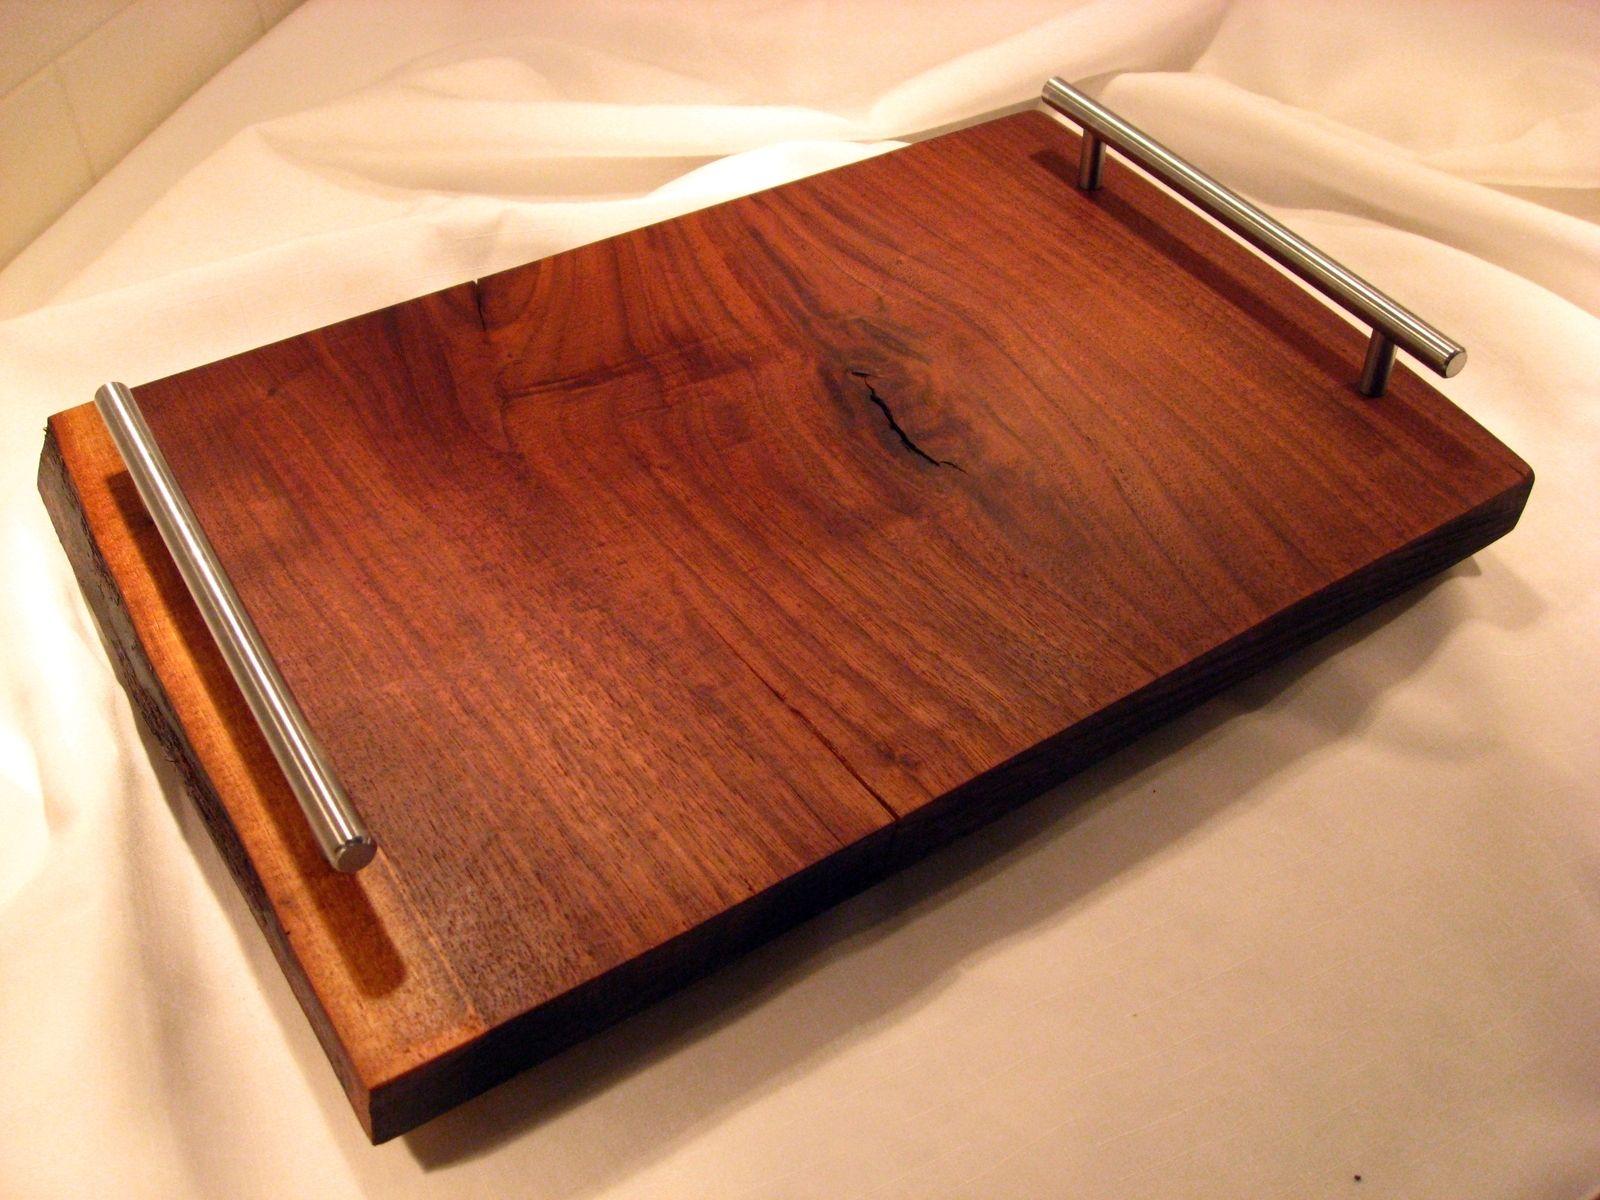 Handmade Live Edge Black Walnut Serving Tray By Krwstudios